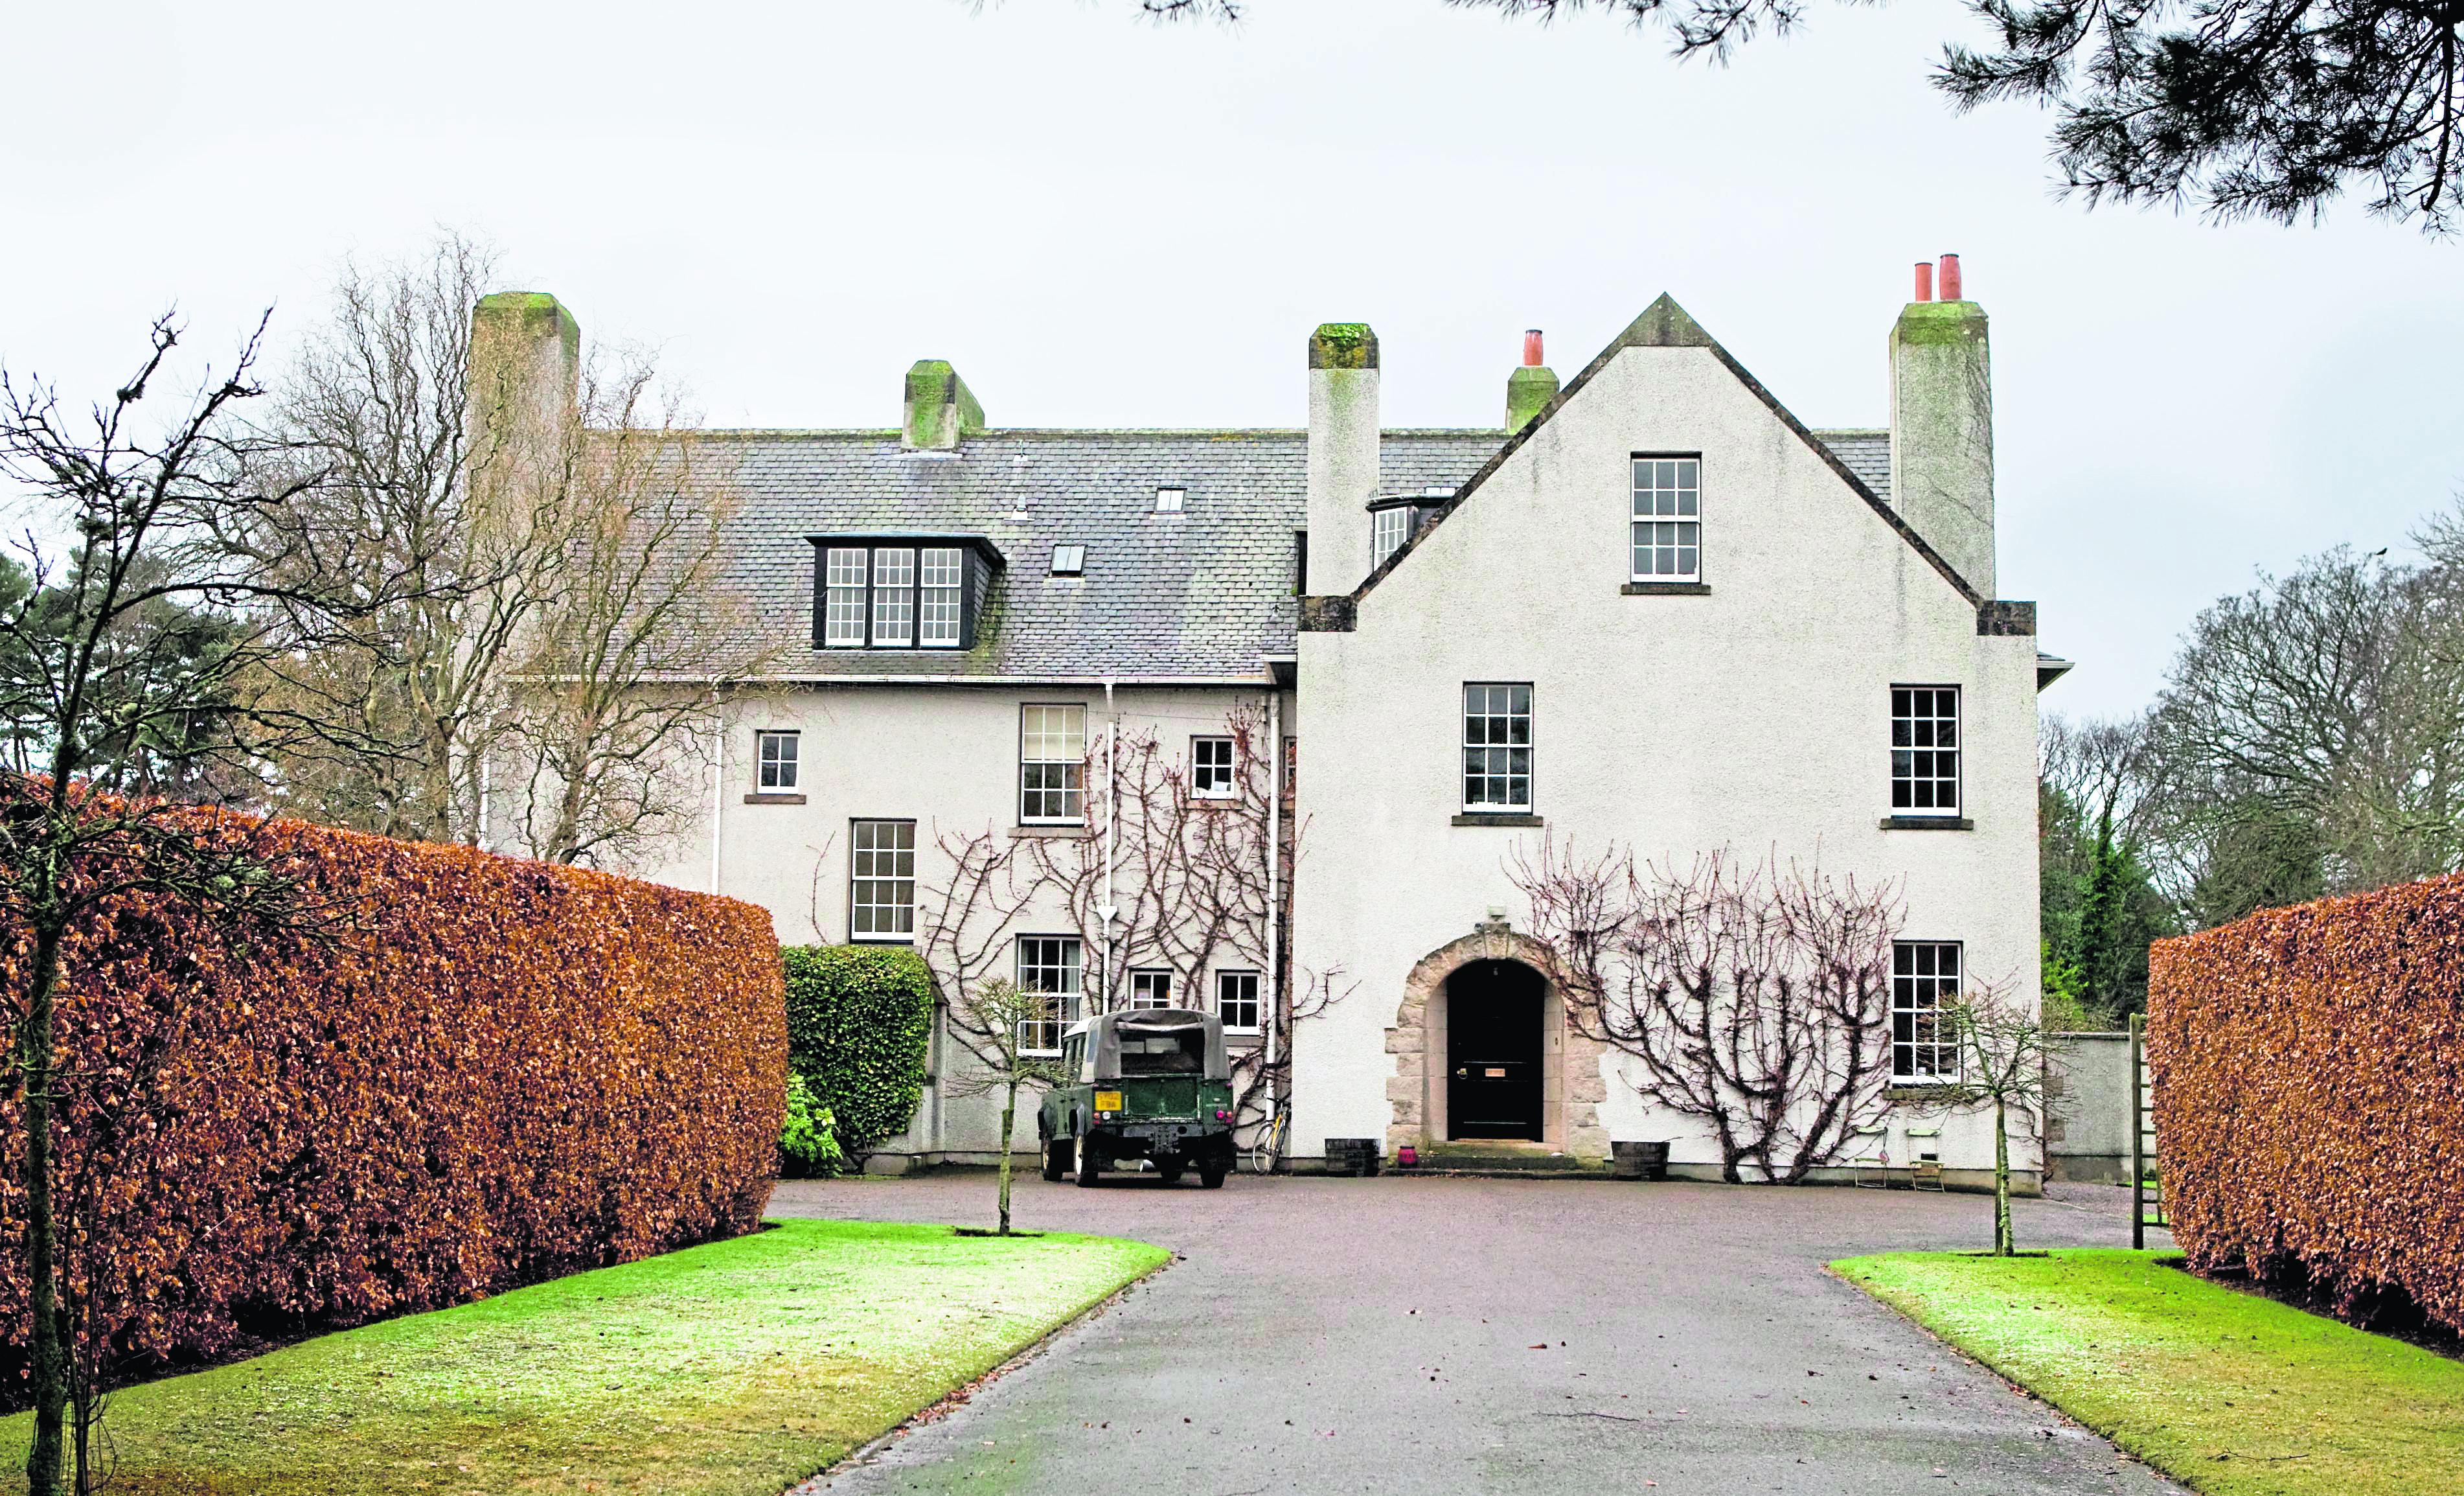 The Nairn home of Oscar nominee actress Tilda Swinton.